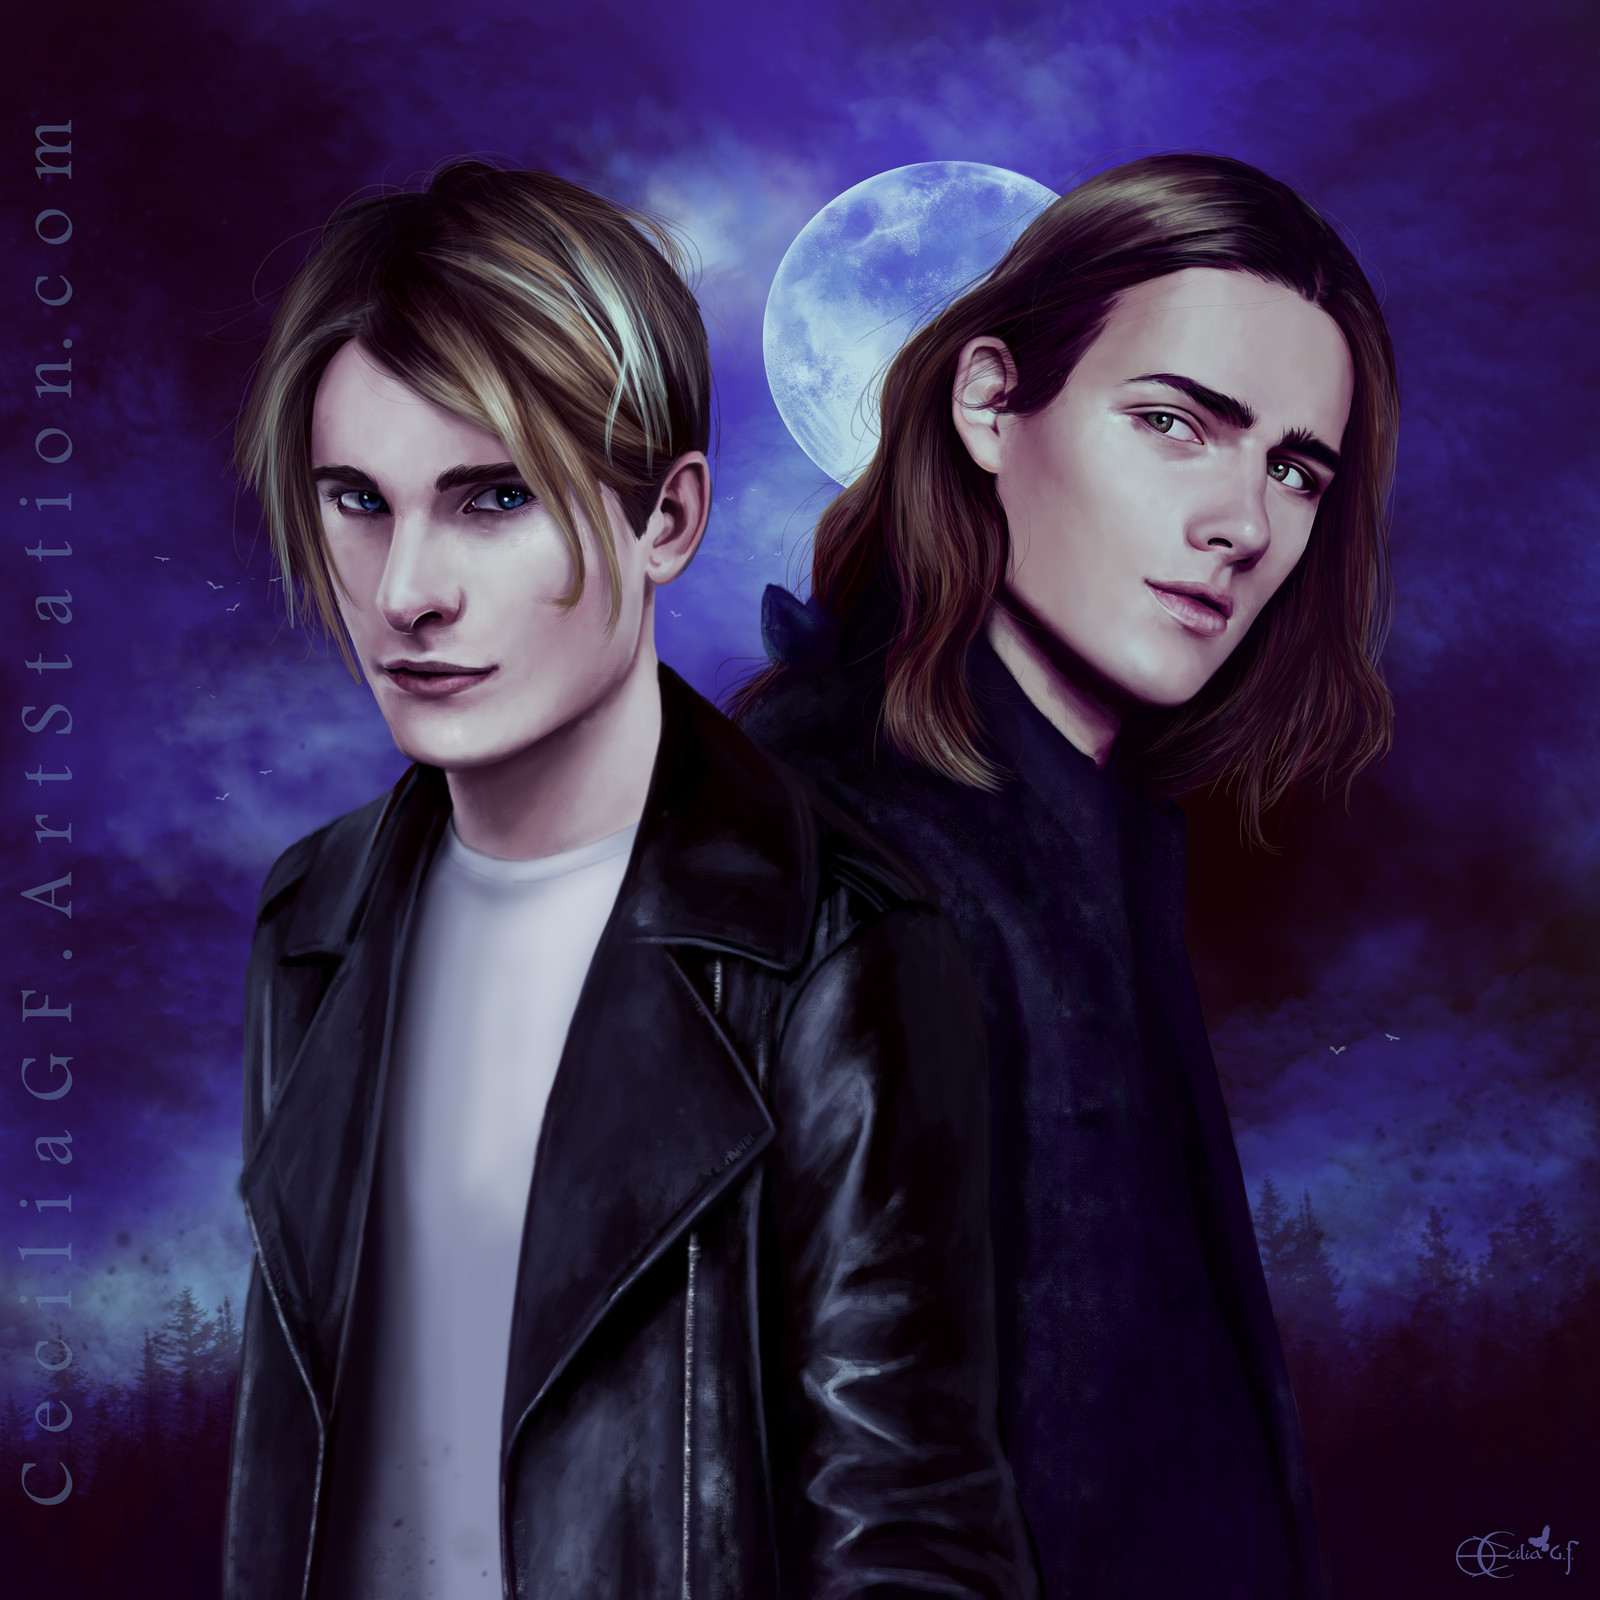 Ian and Eric